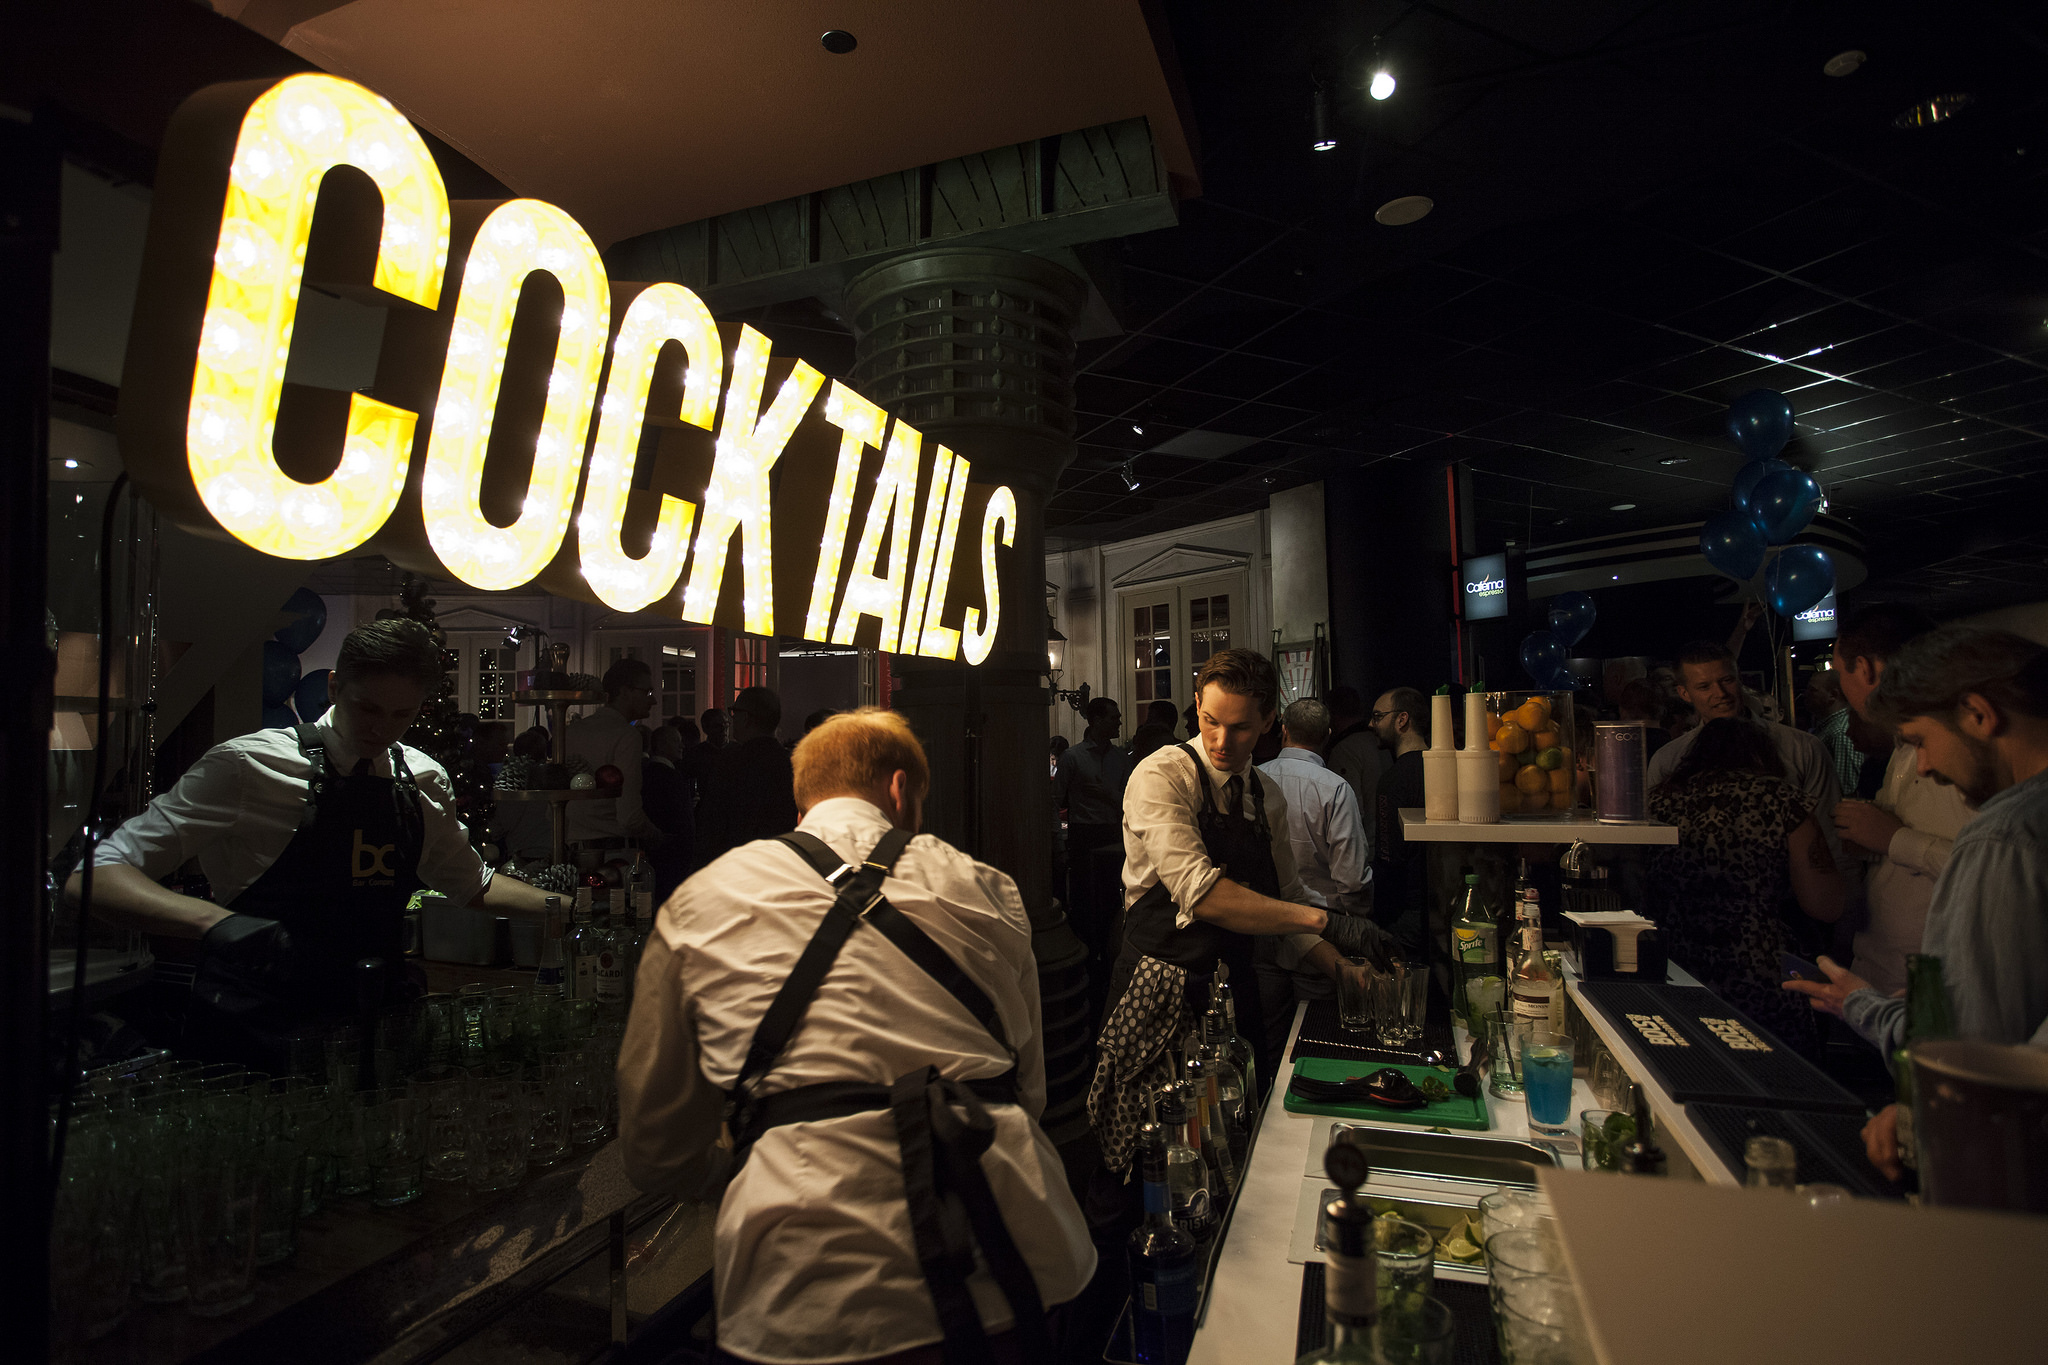 Huur een cocktail bar in Gatsby stijl